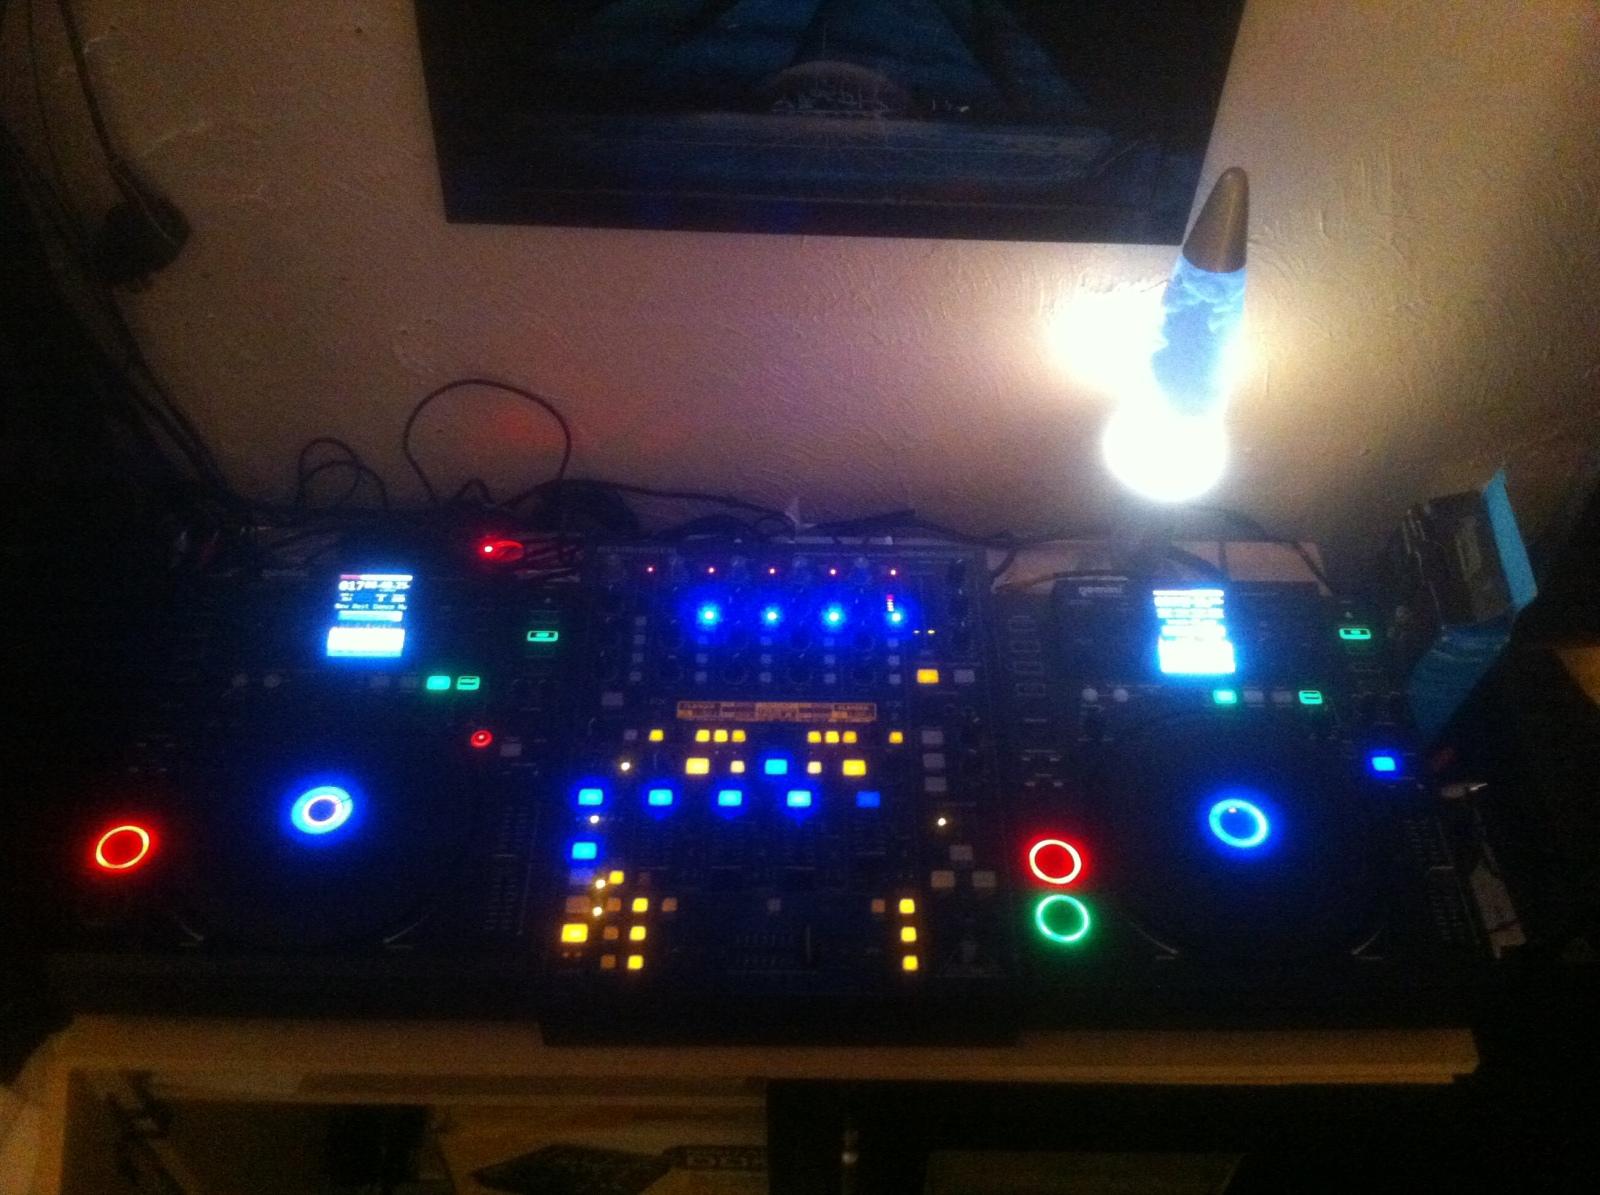 O meu sistema (Nuno Santos) 2qxsvf4